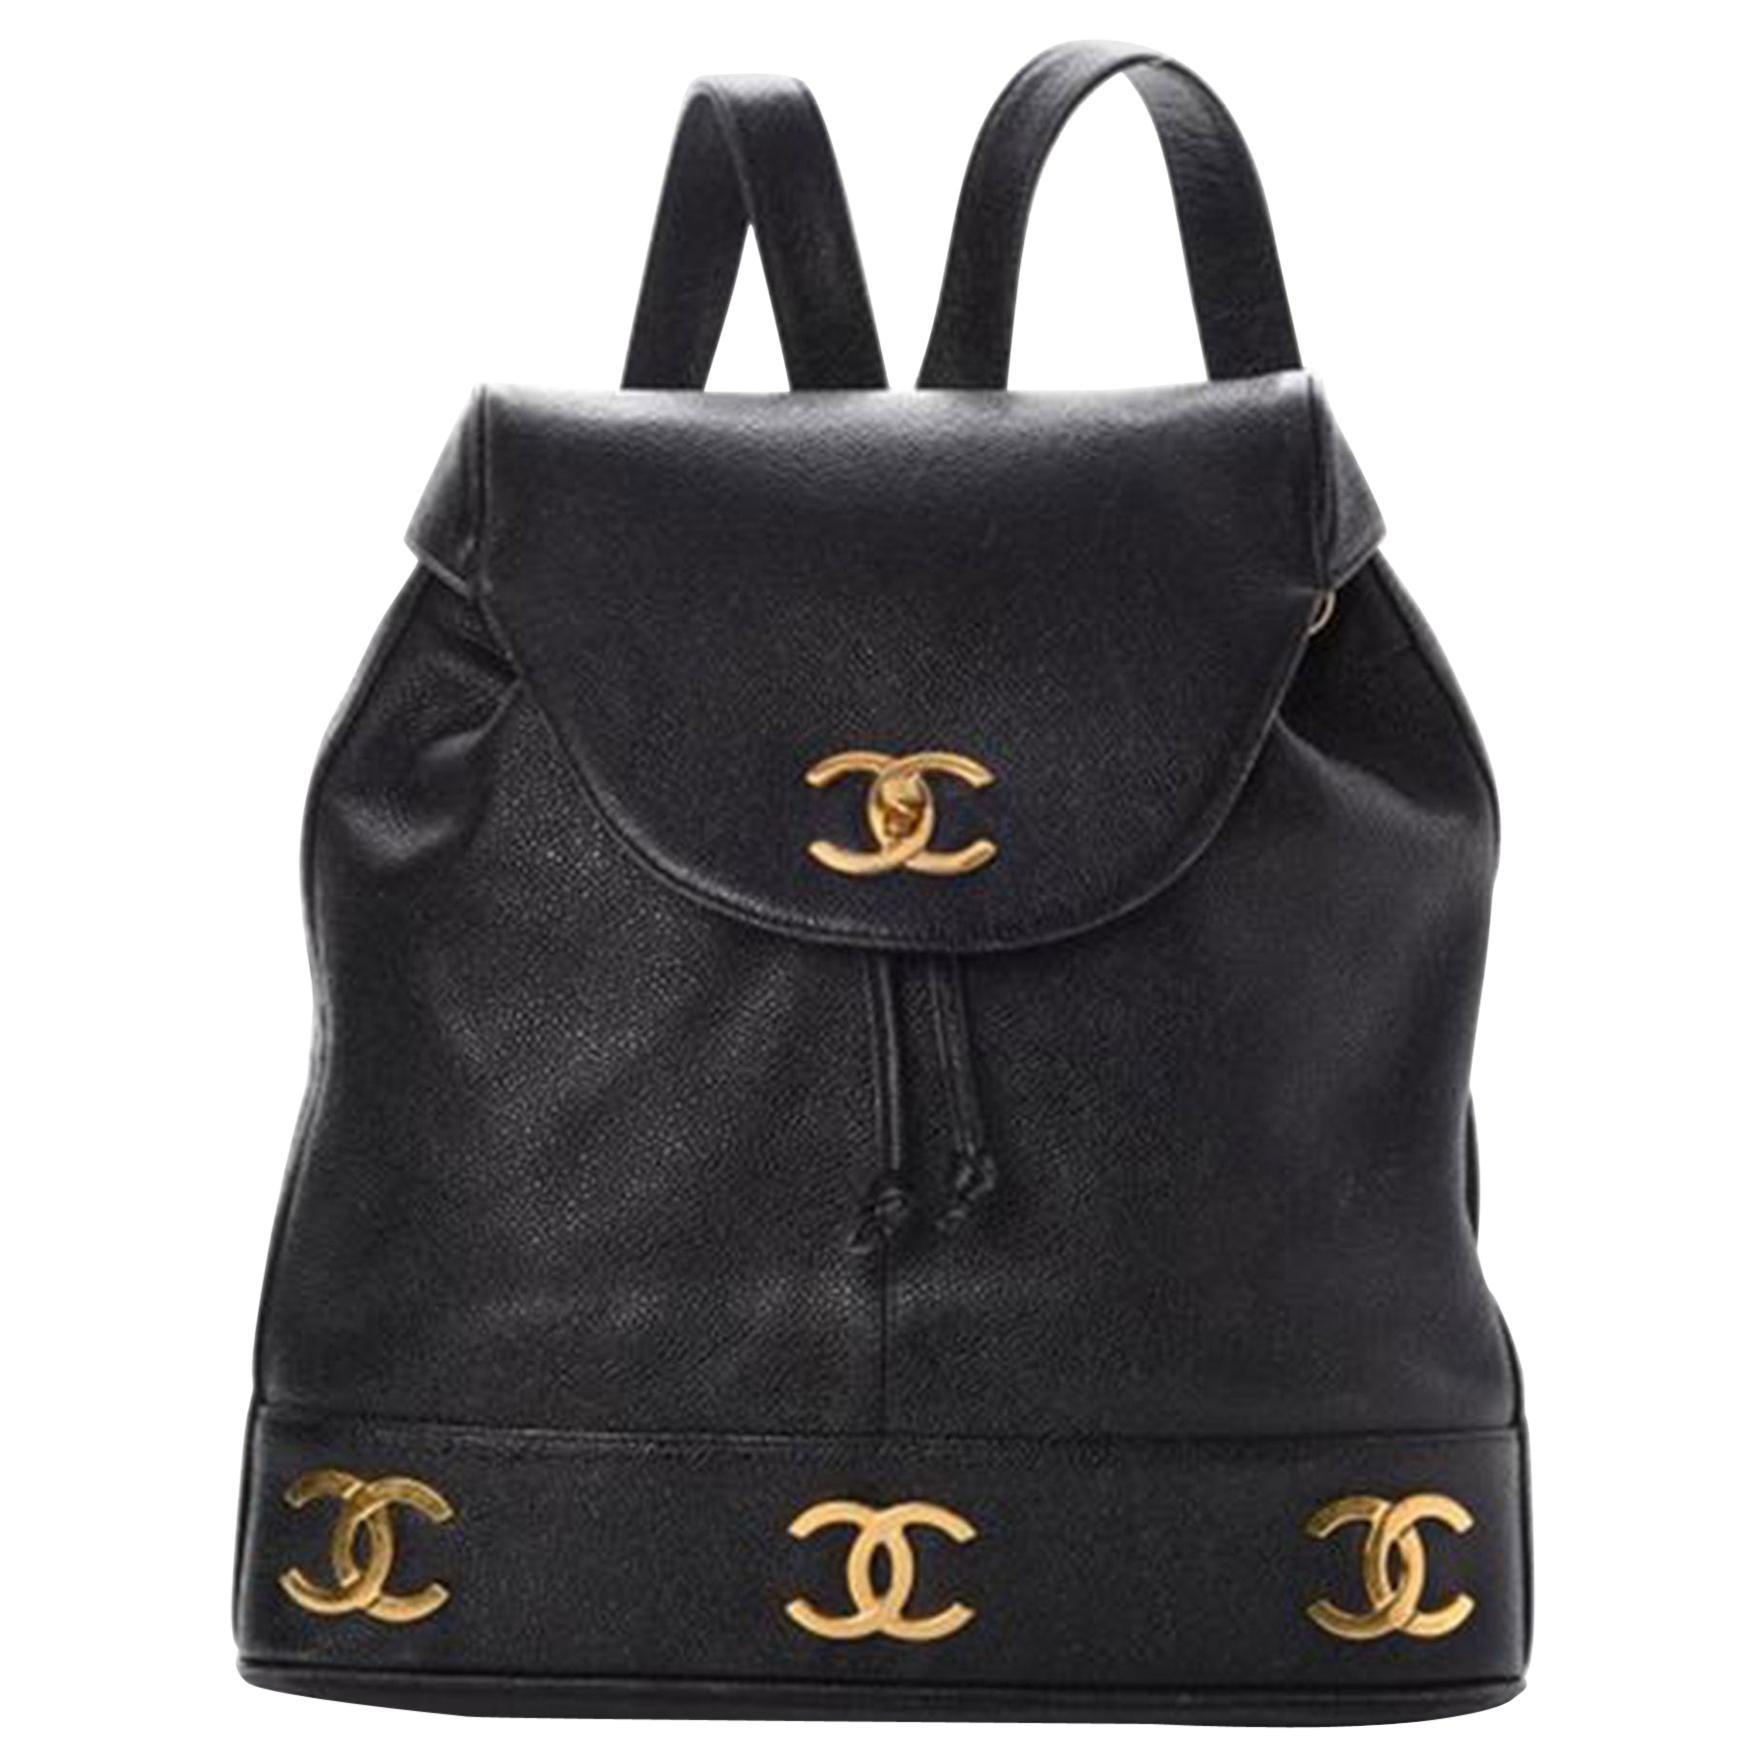 Chanel Drawstring Vintage 1990s Cc Rucksack Black Caviar Leather Backpack